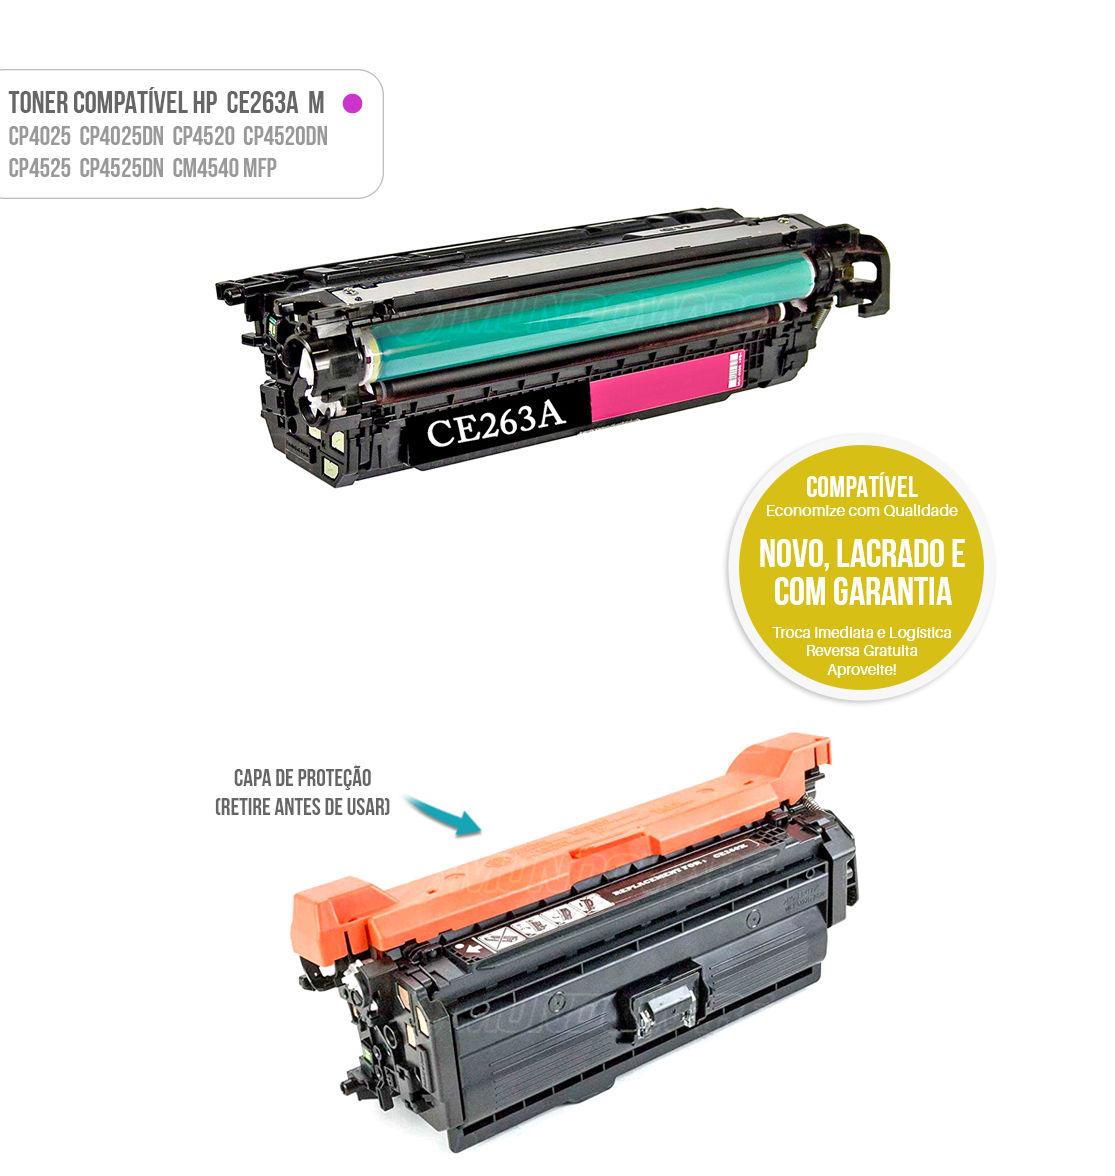 Toner Compatível Magenta CE263A CE-263 A para impressora Laser Color HP CP4025 CP4520 CM4540 CP4525DN 4025DN 4520DN